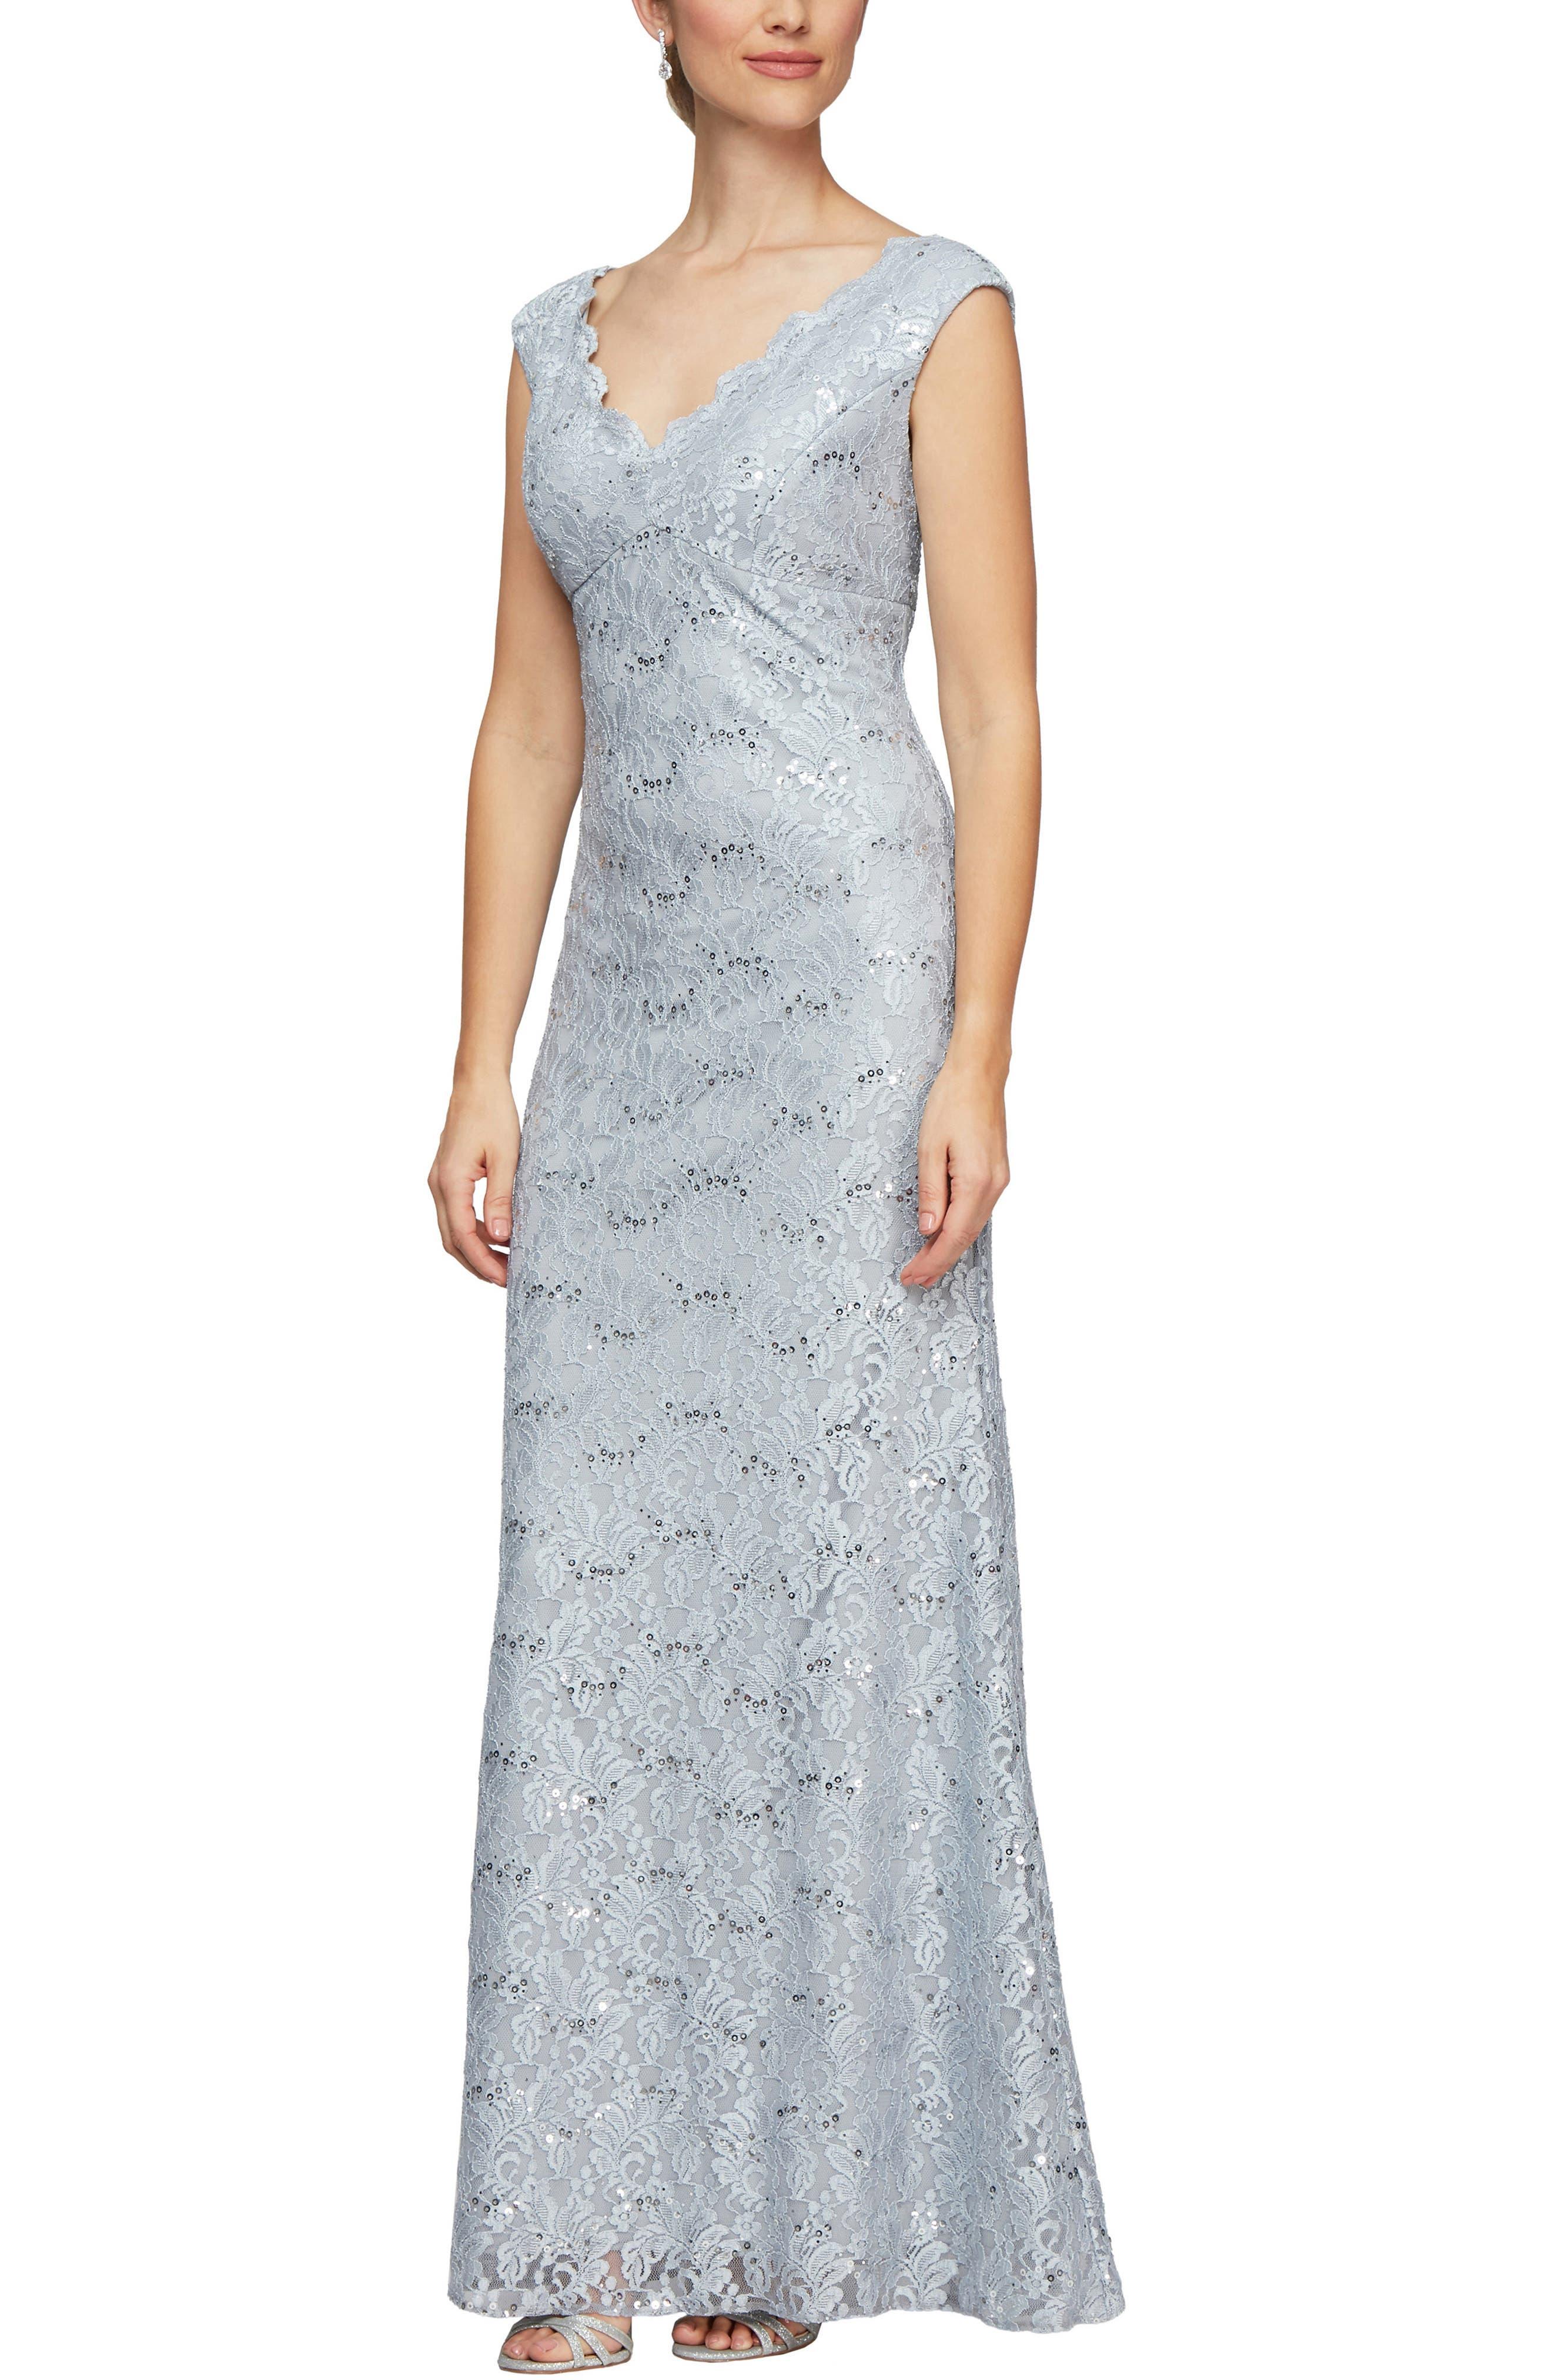 Scallop Lace Evening Dress